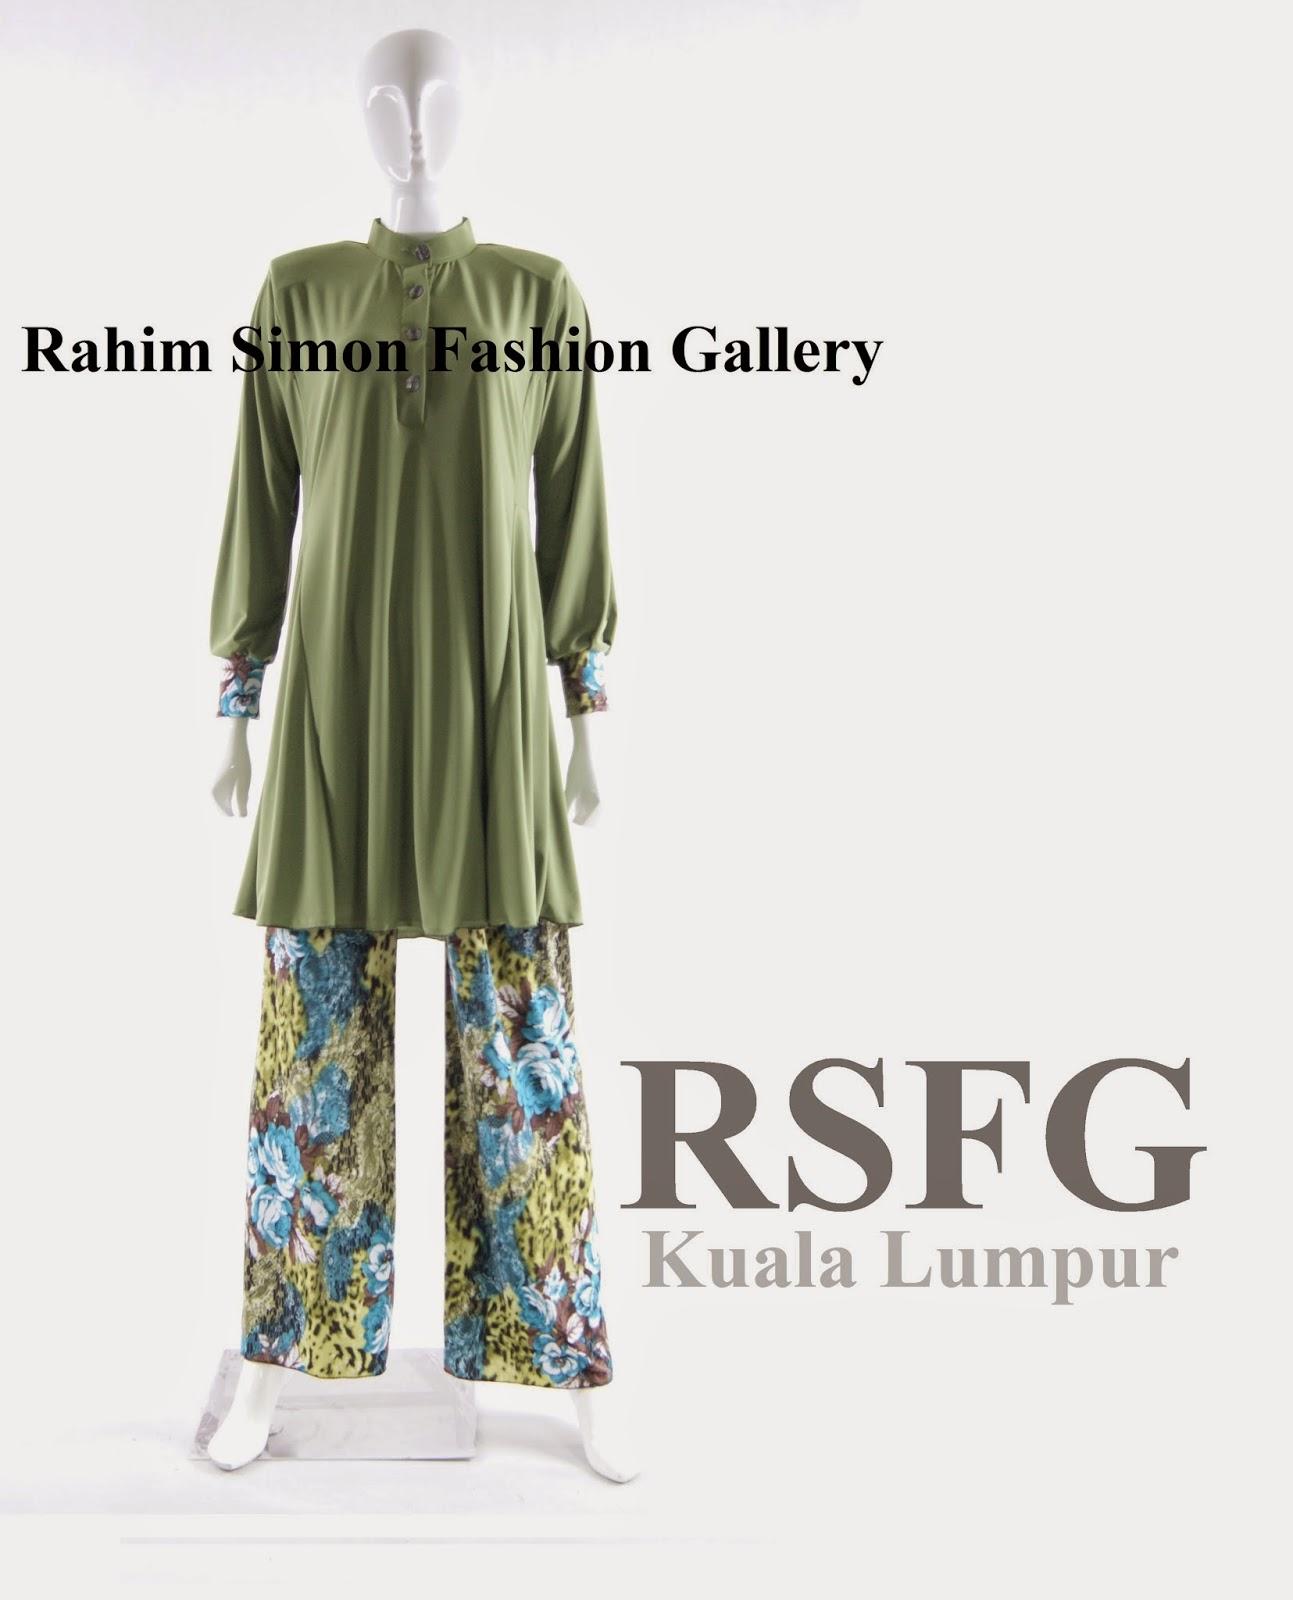 Butik Online Rsfg Kuala Lumpur Pemborong Pakaian Wanita Murah